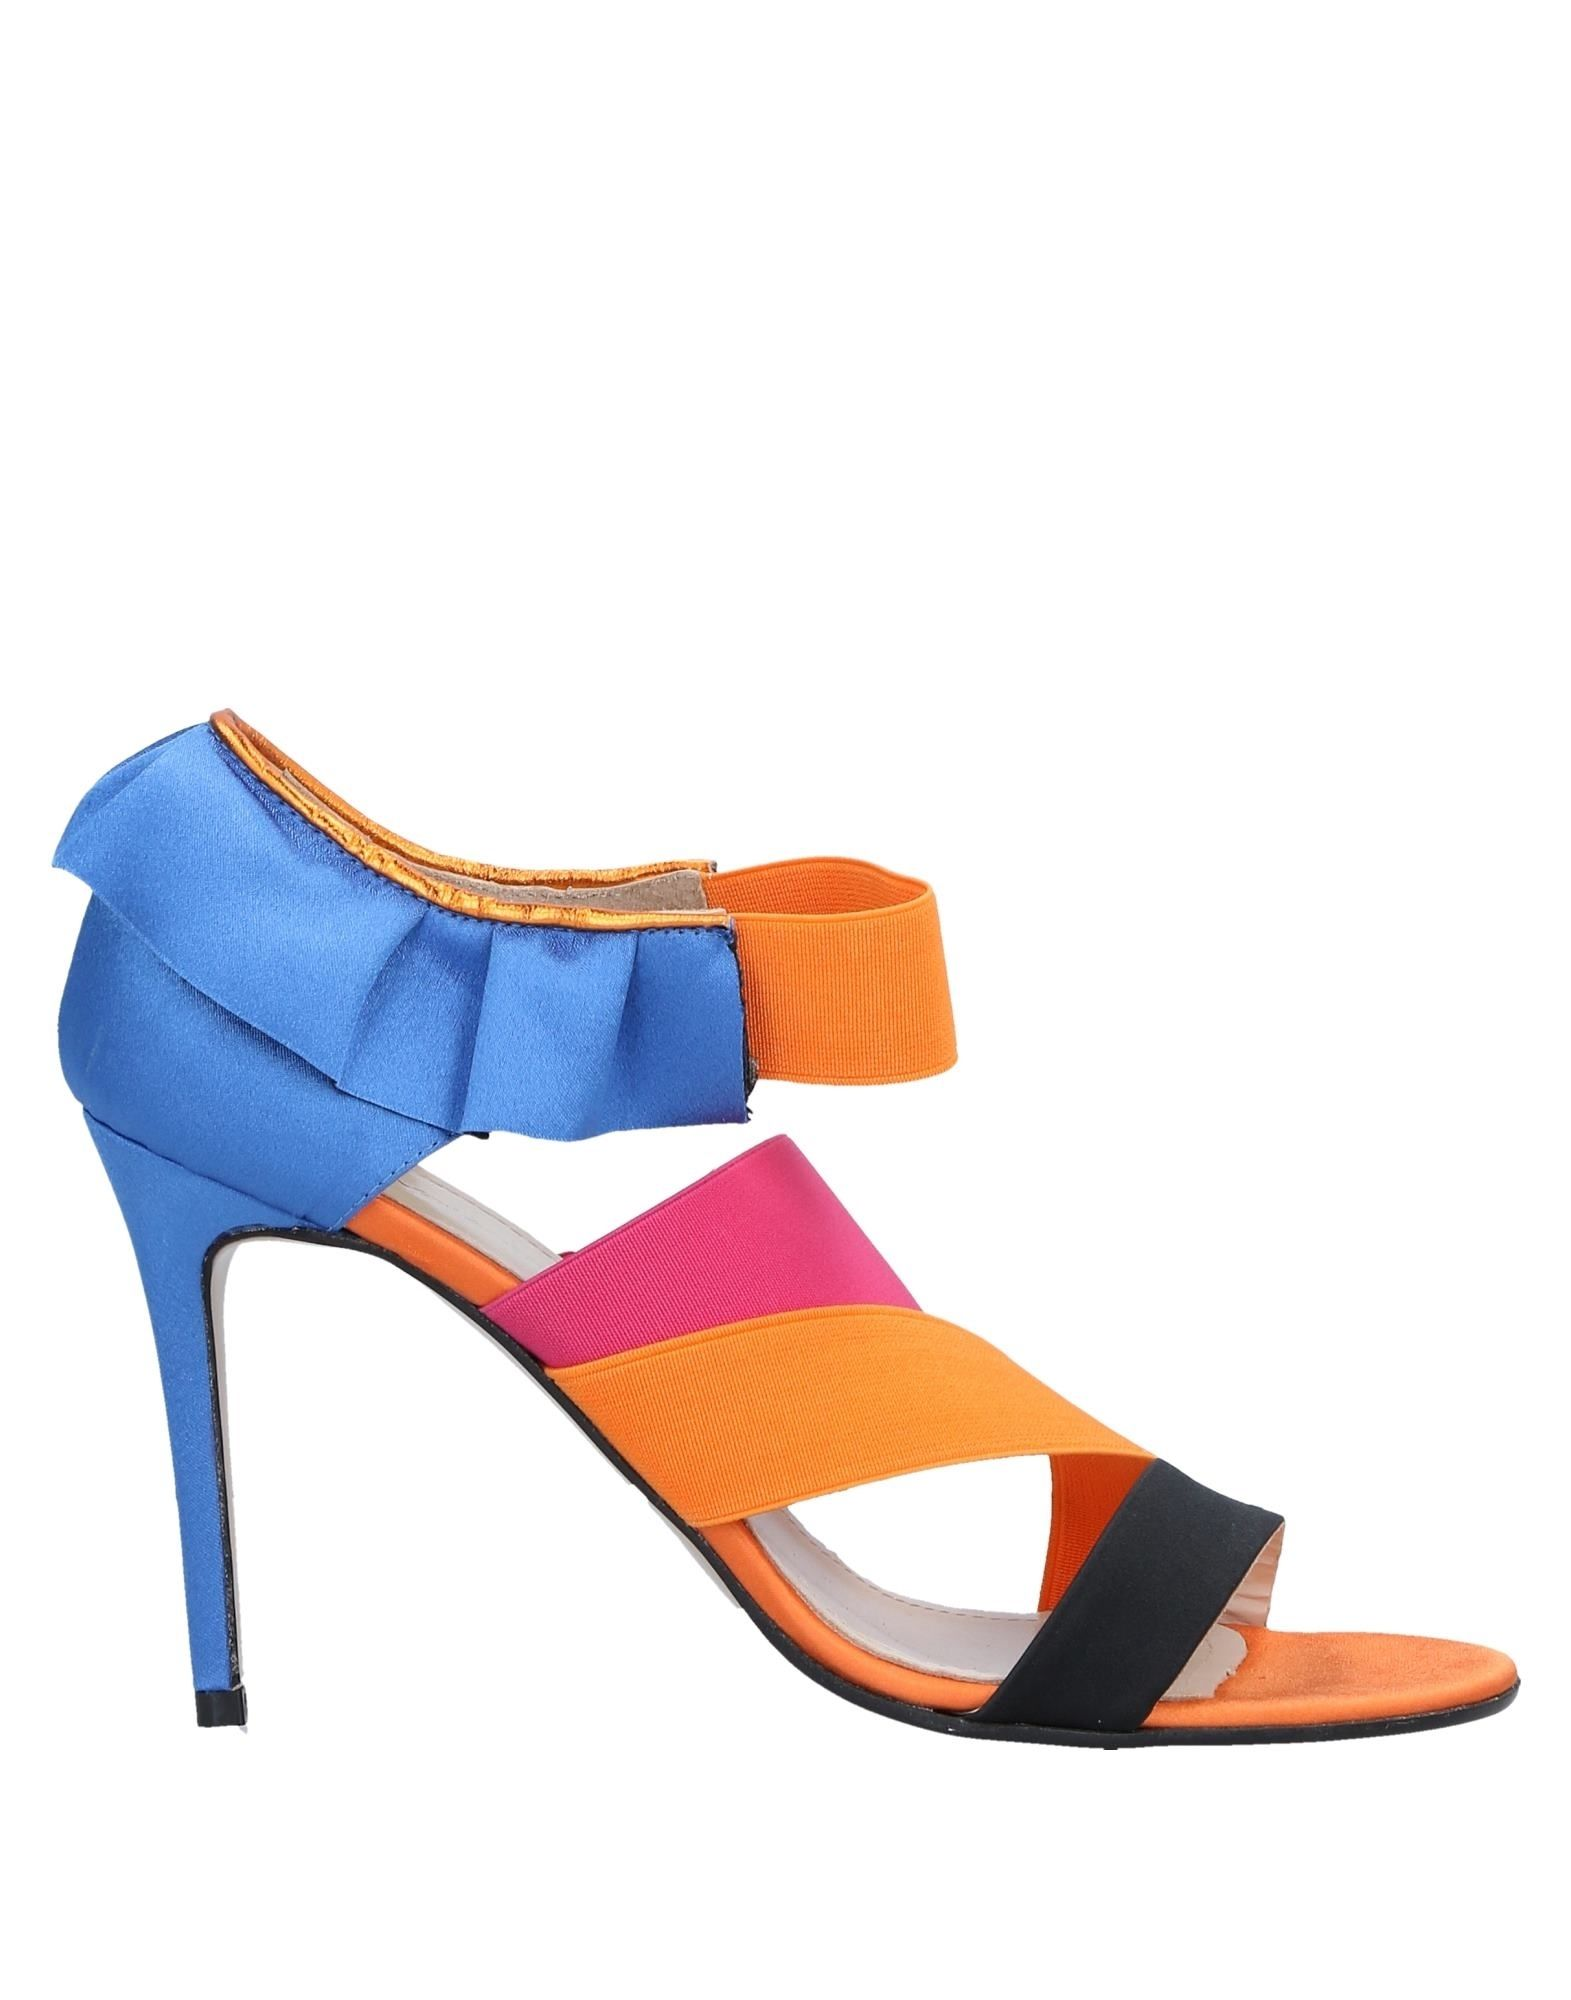 Luca Luca Valentini Sandals - Women Luca Luca Valentini Sandals online on  Canada - 11519734EK e3a46b